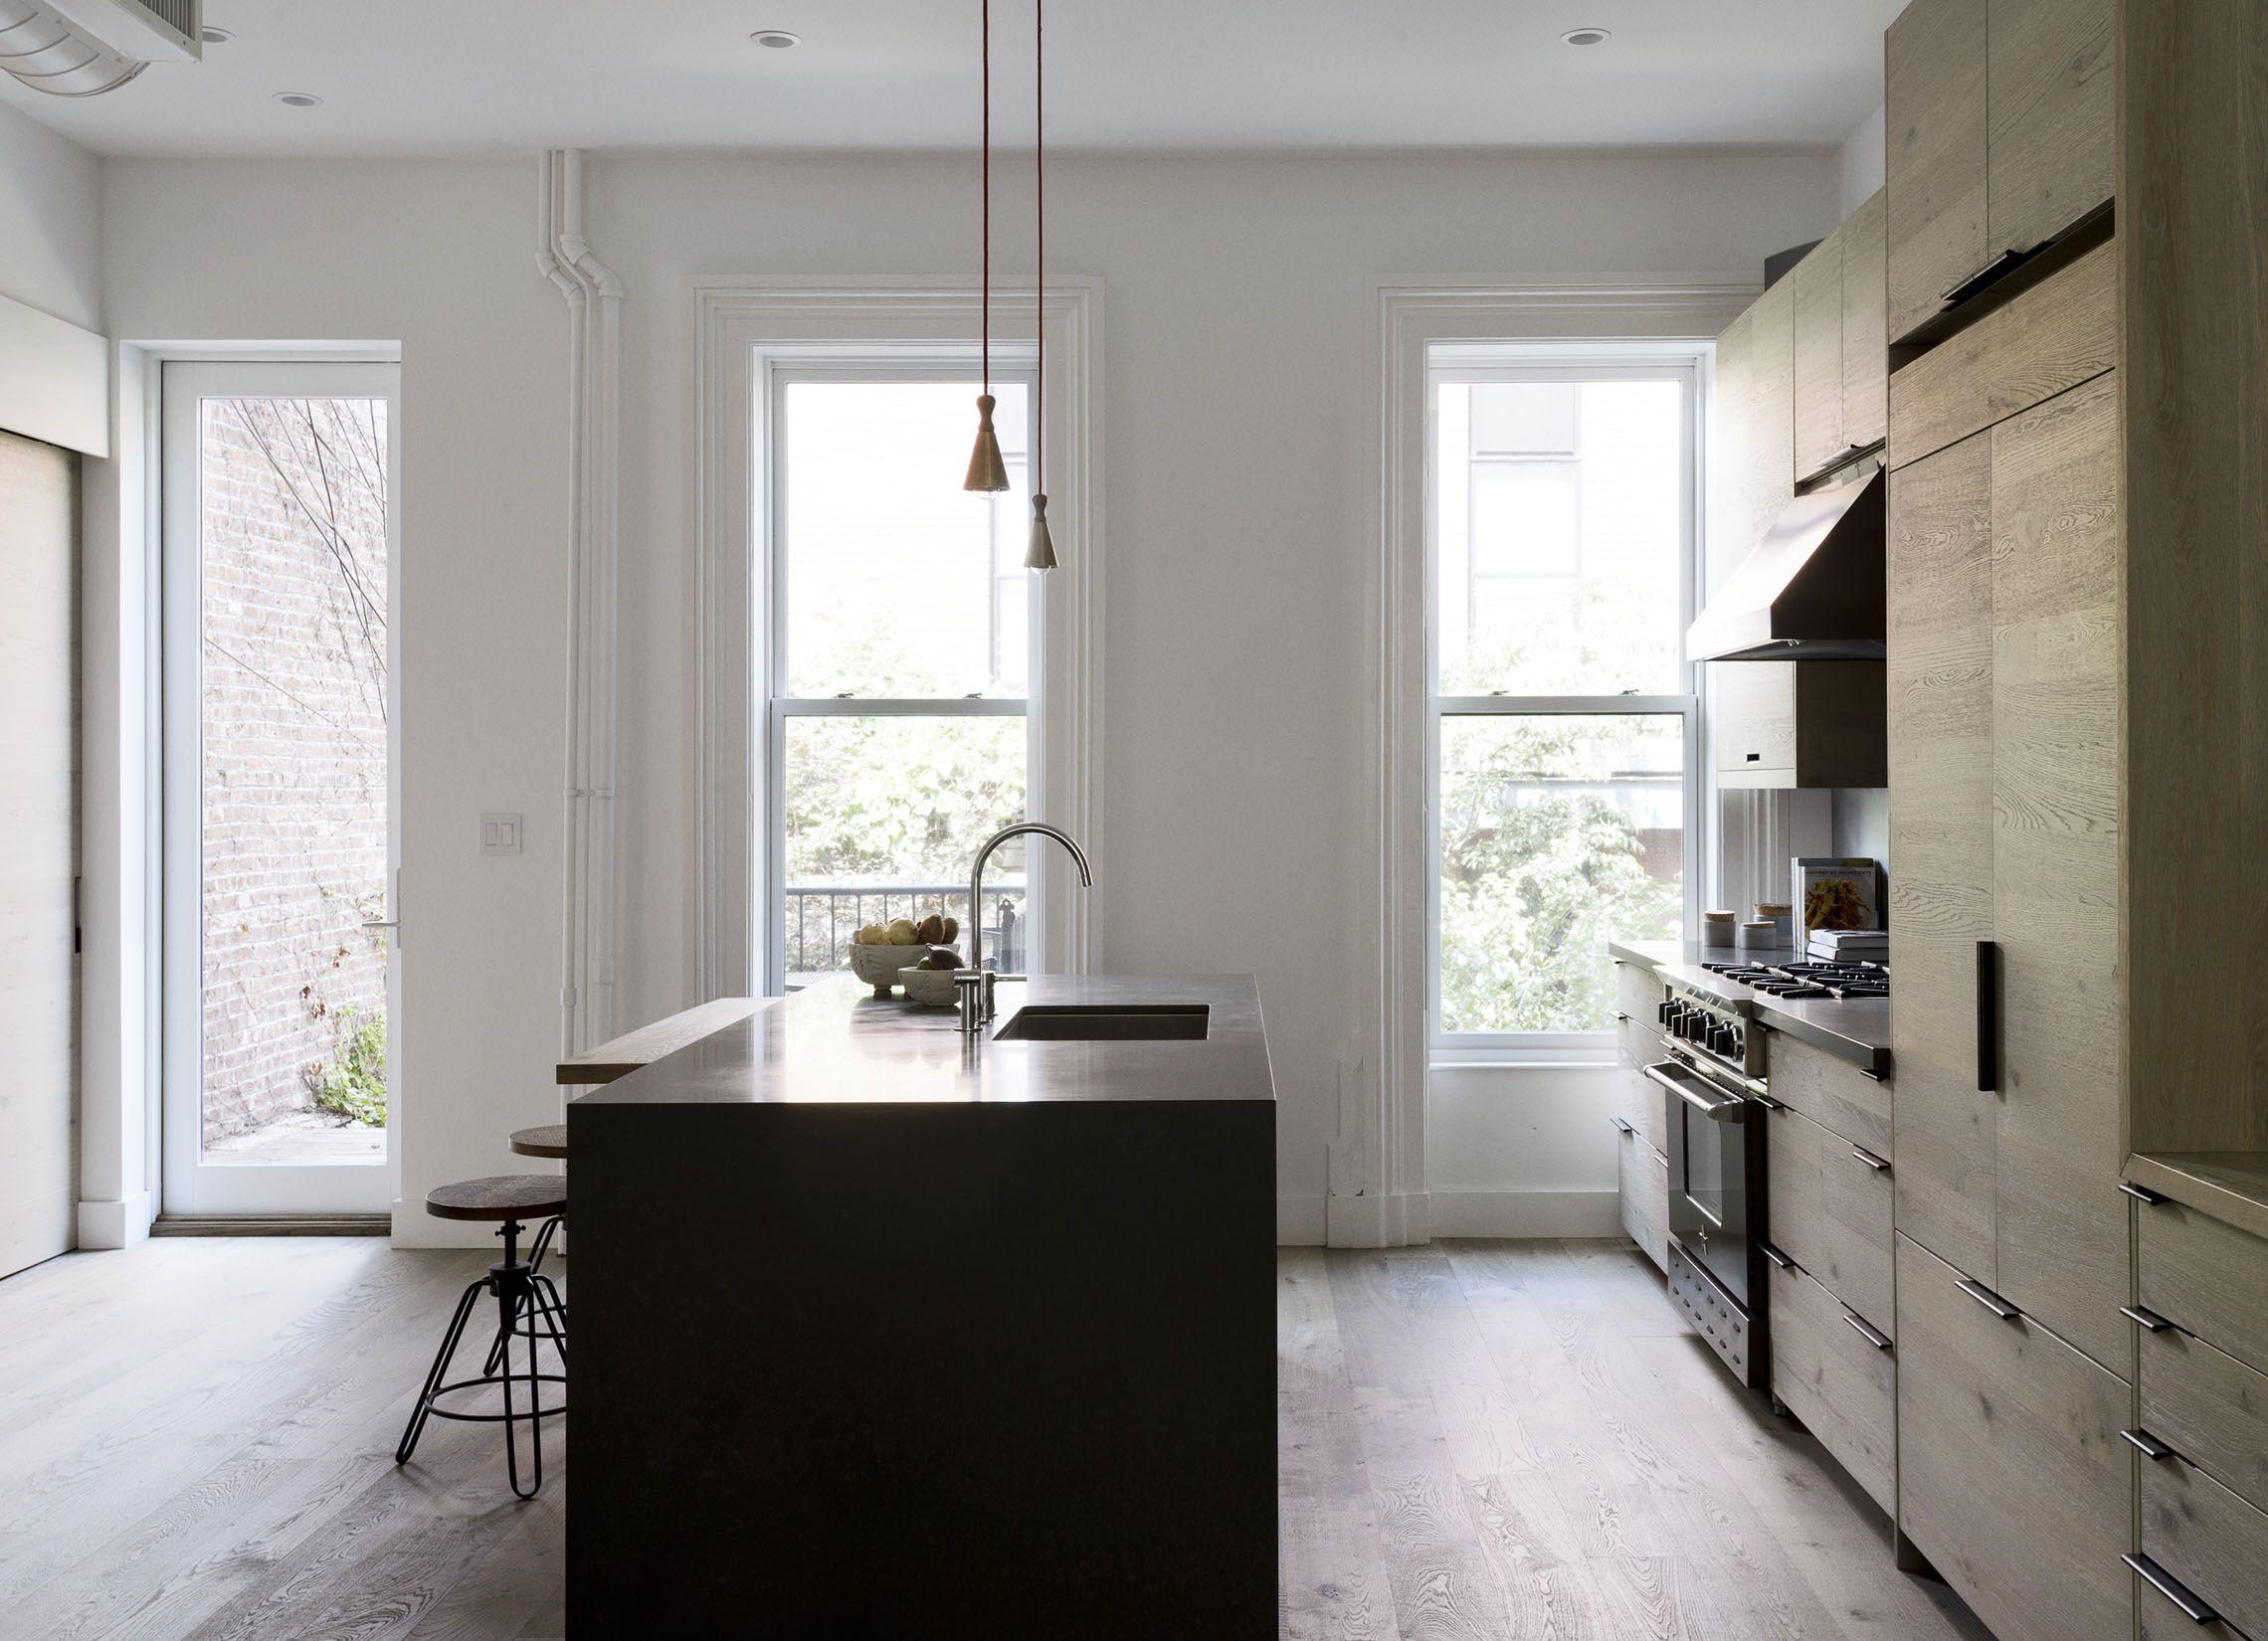 Brooklyn kitchen design with custom wood cabinets